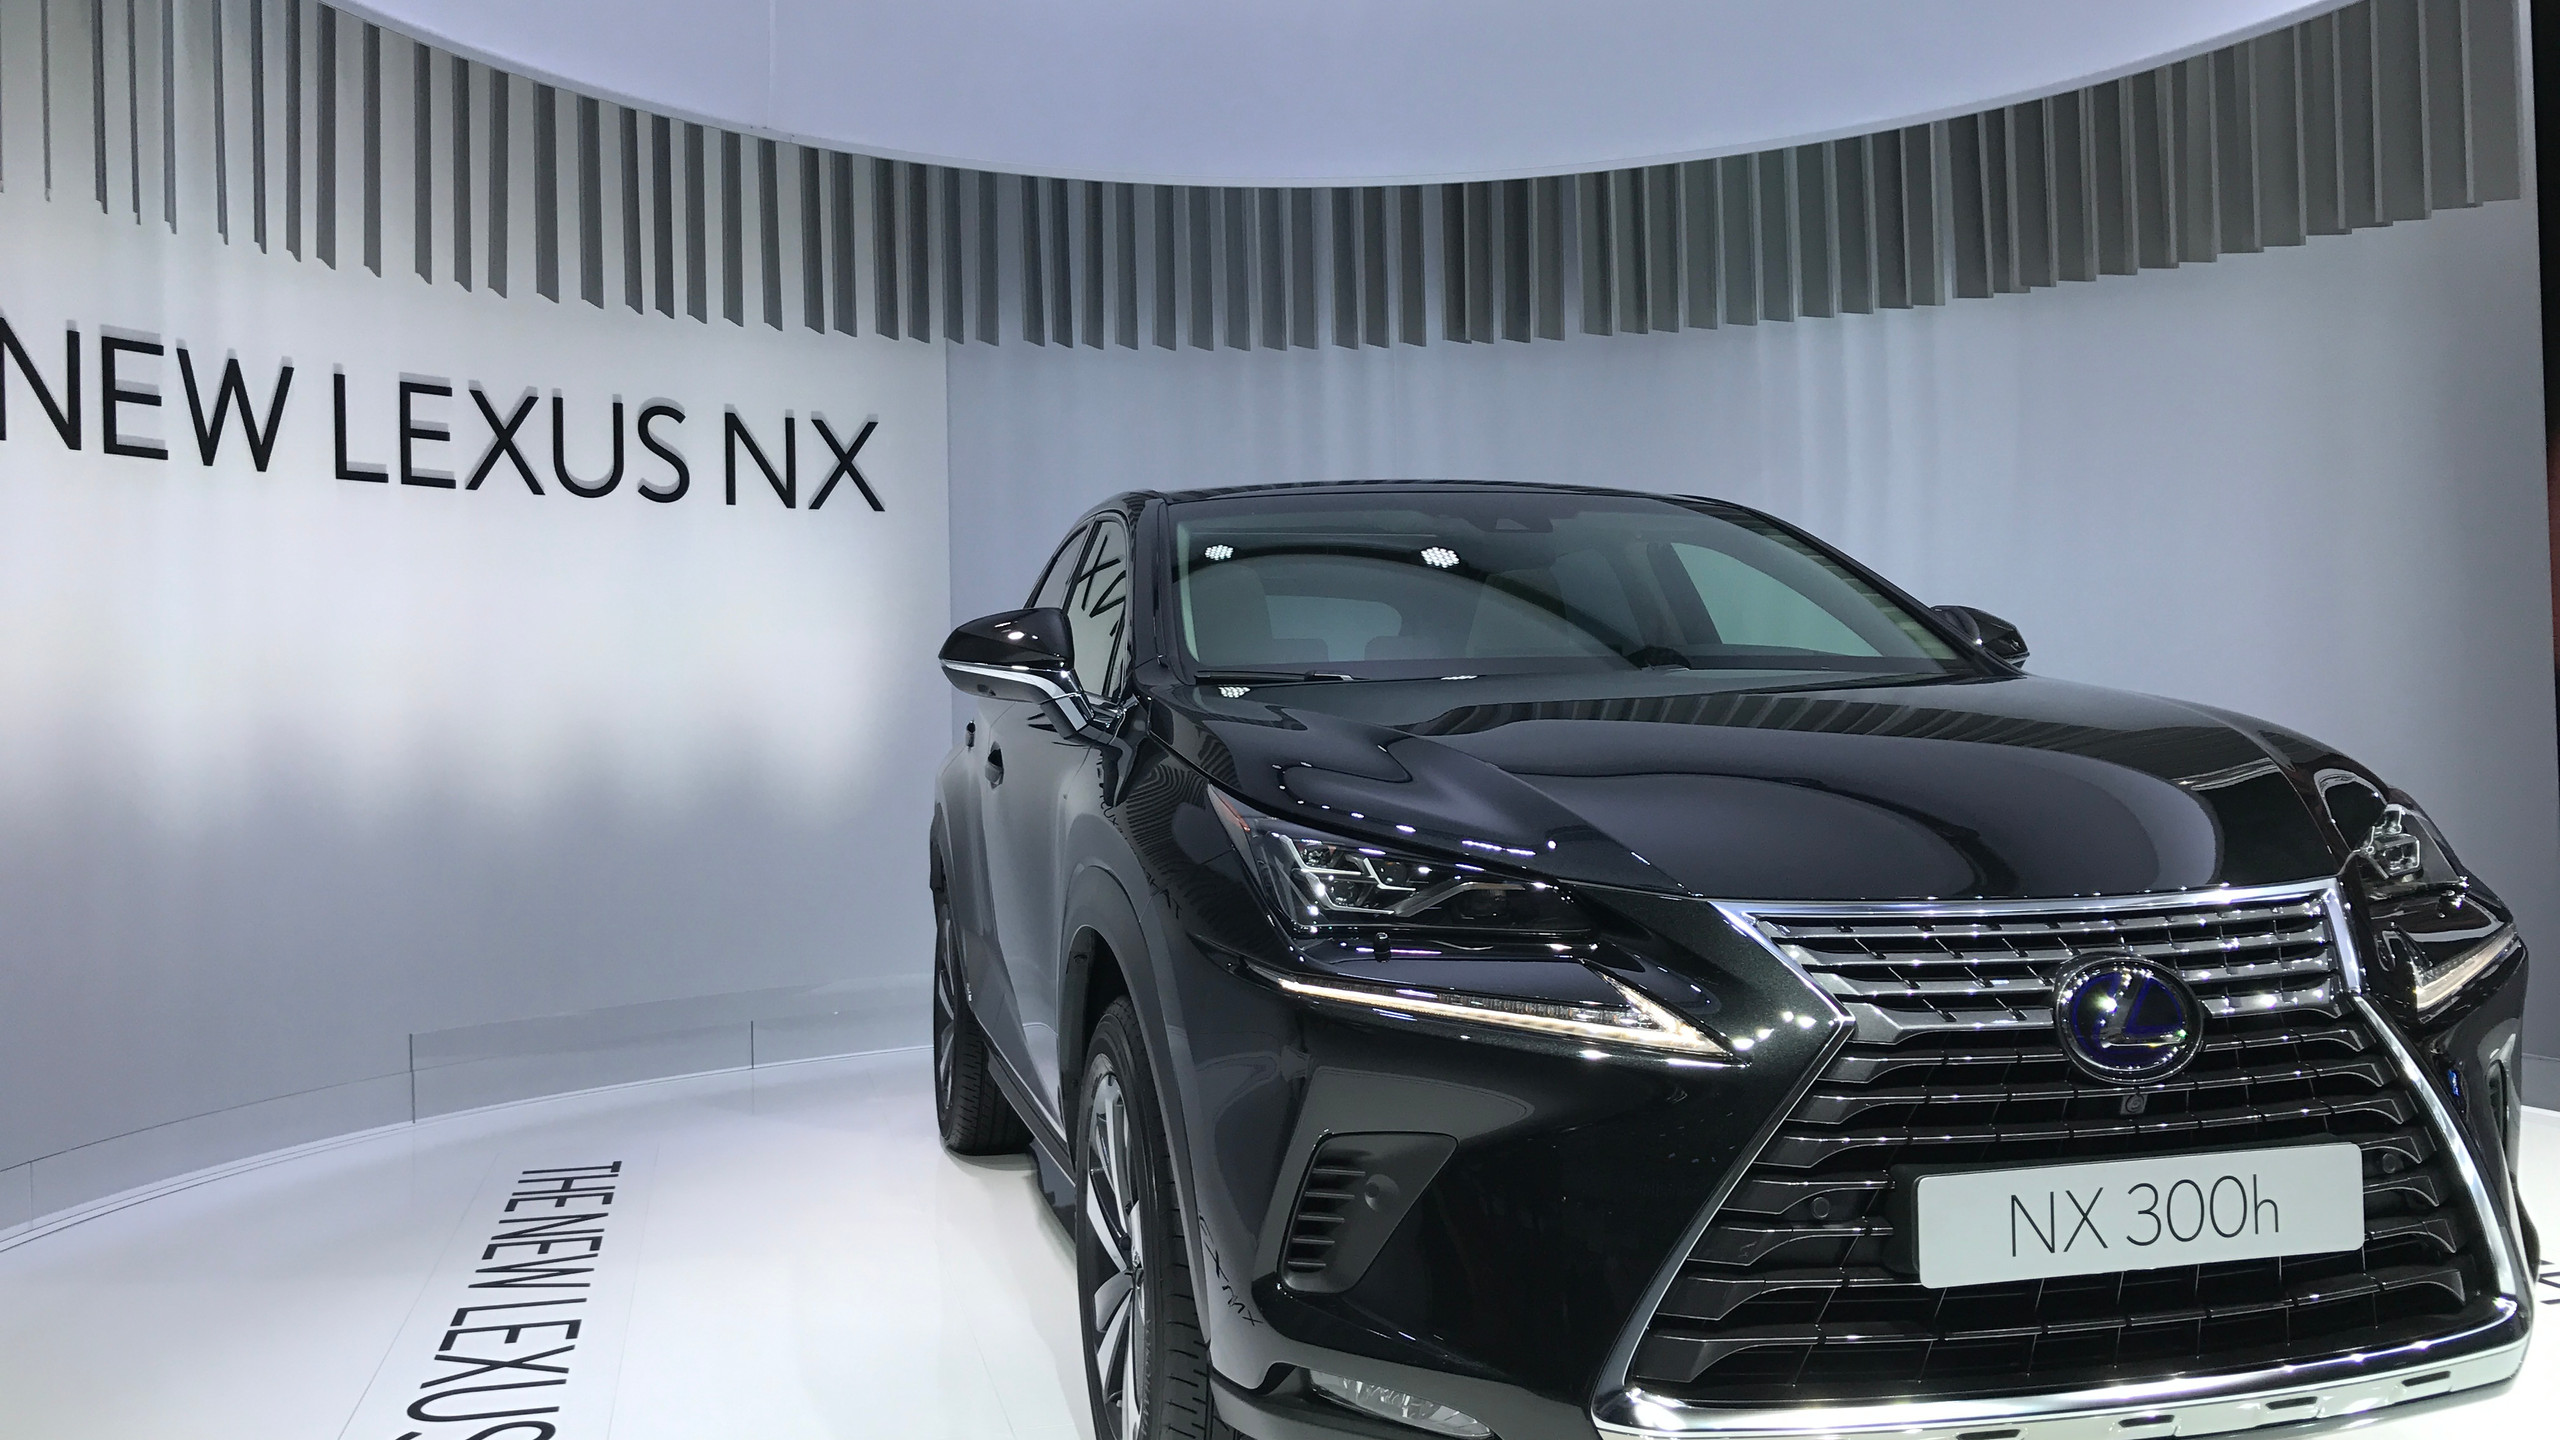 Lexus NX 300, frontale rivisto